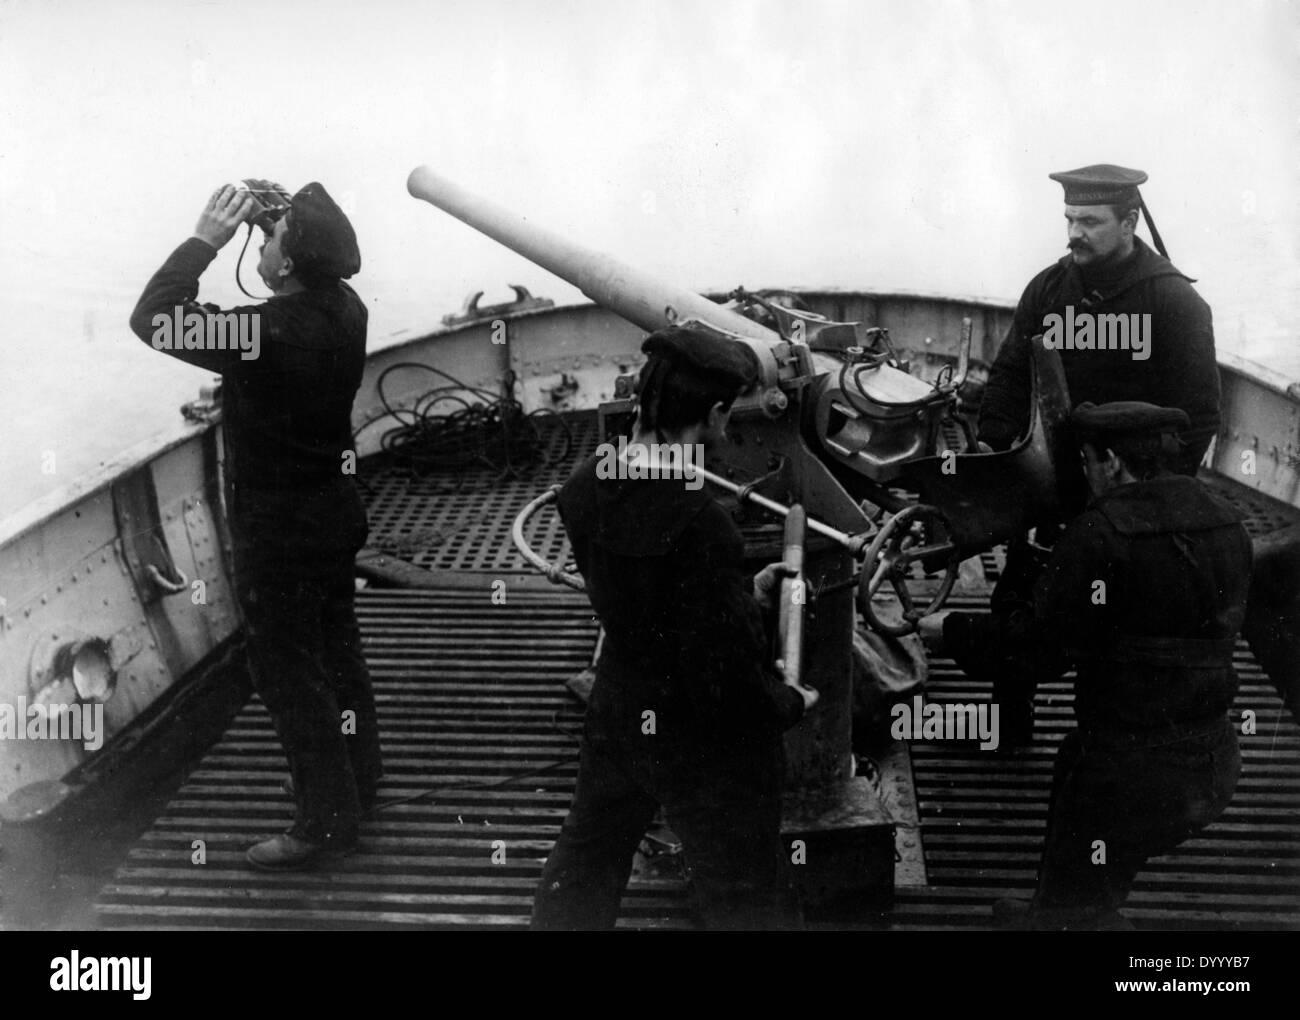 Sailors on bord of a German patrol ship, 1916 - Stock Image